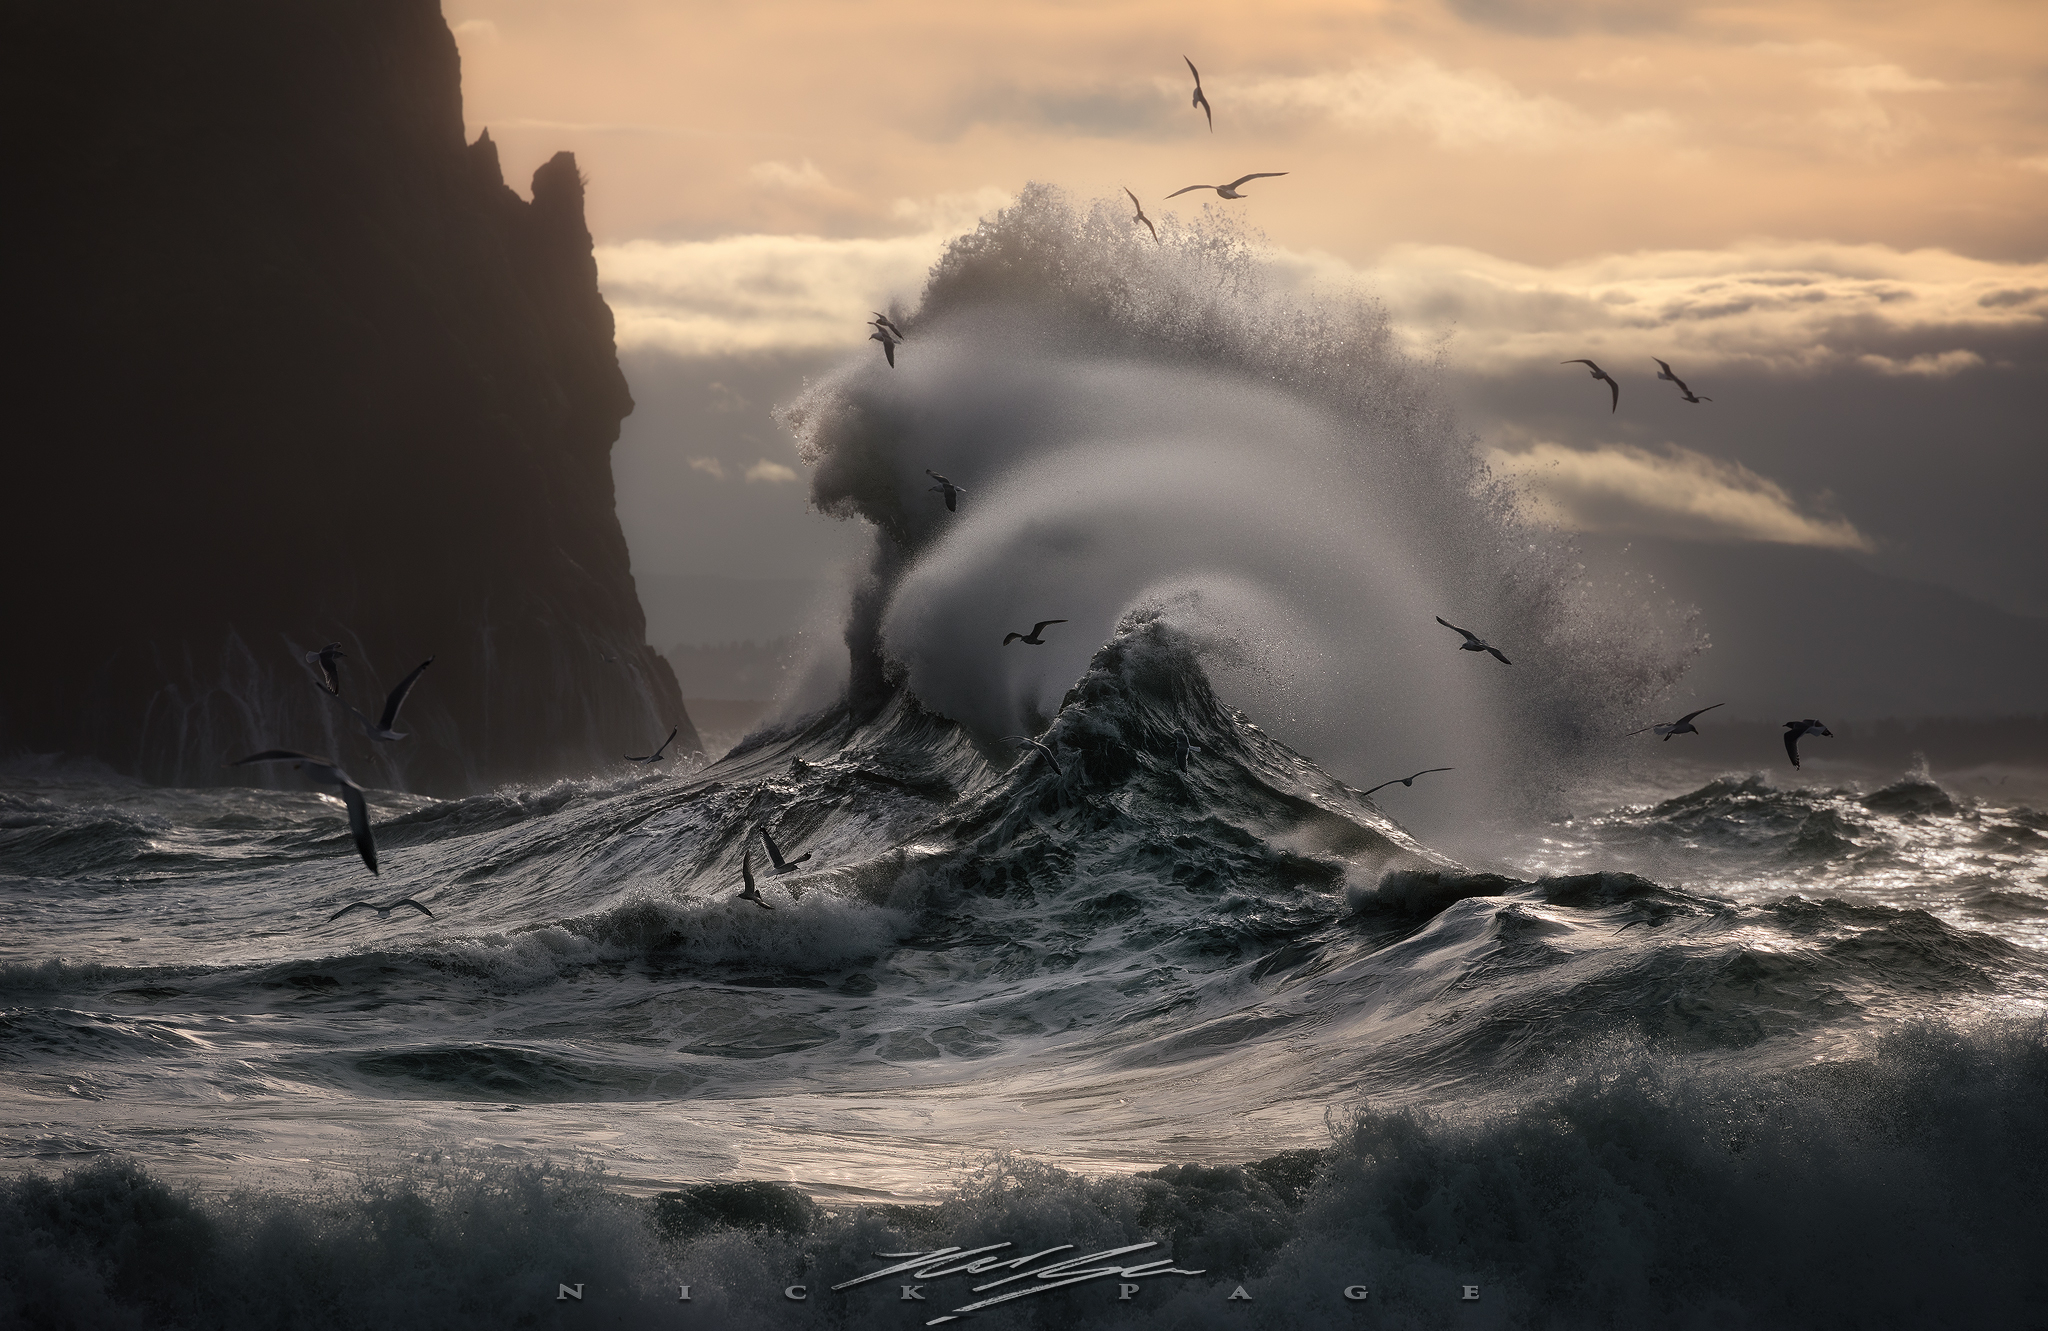 The-sea-god-has-awoke.jpg